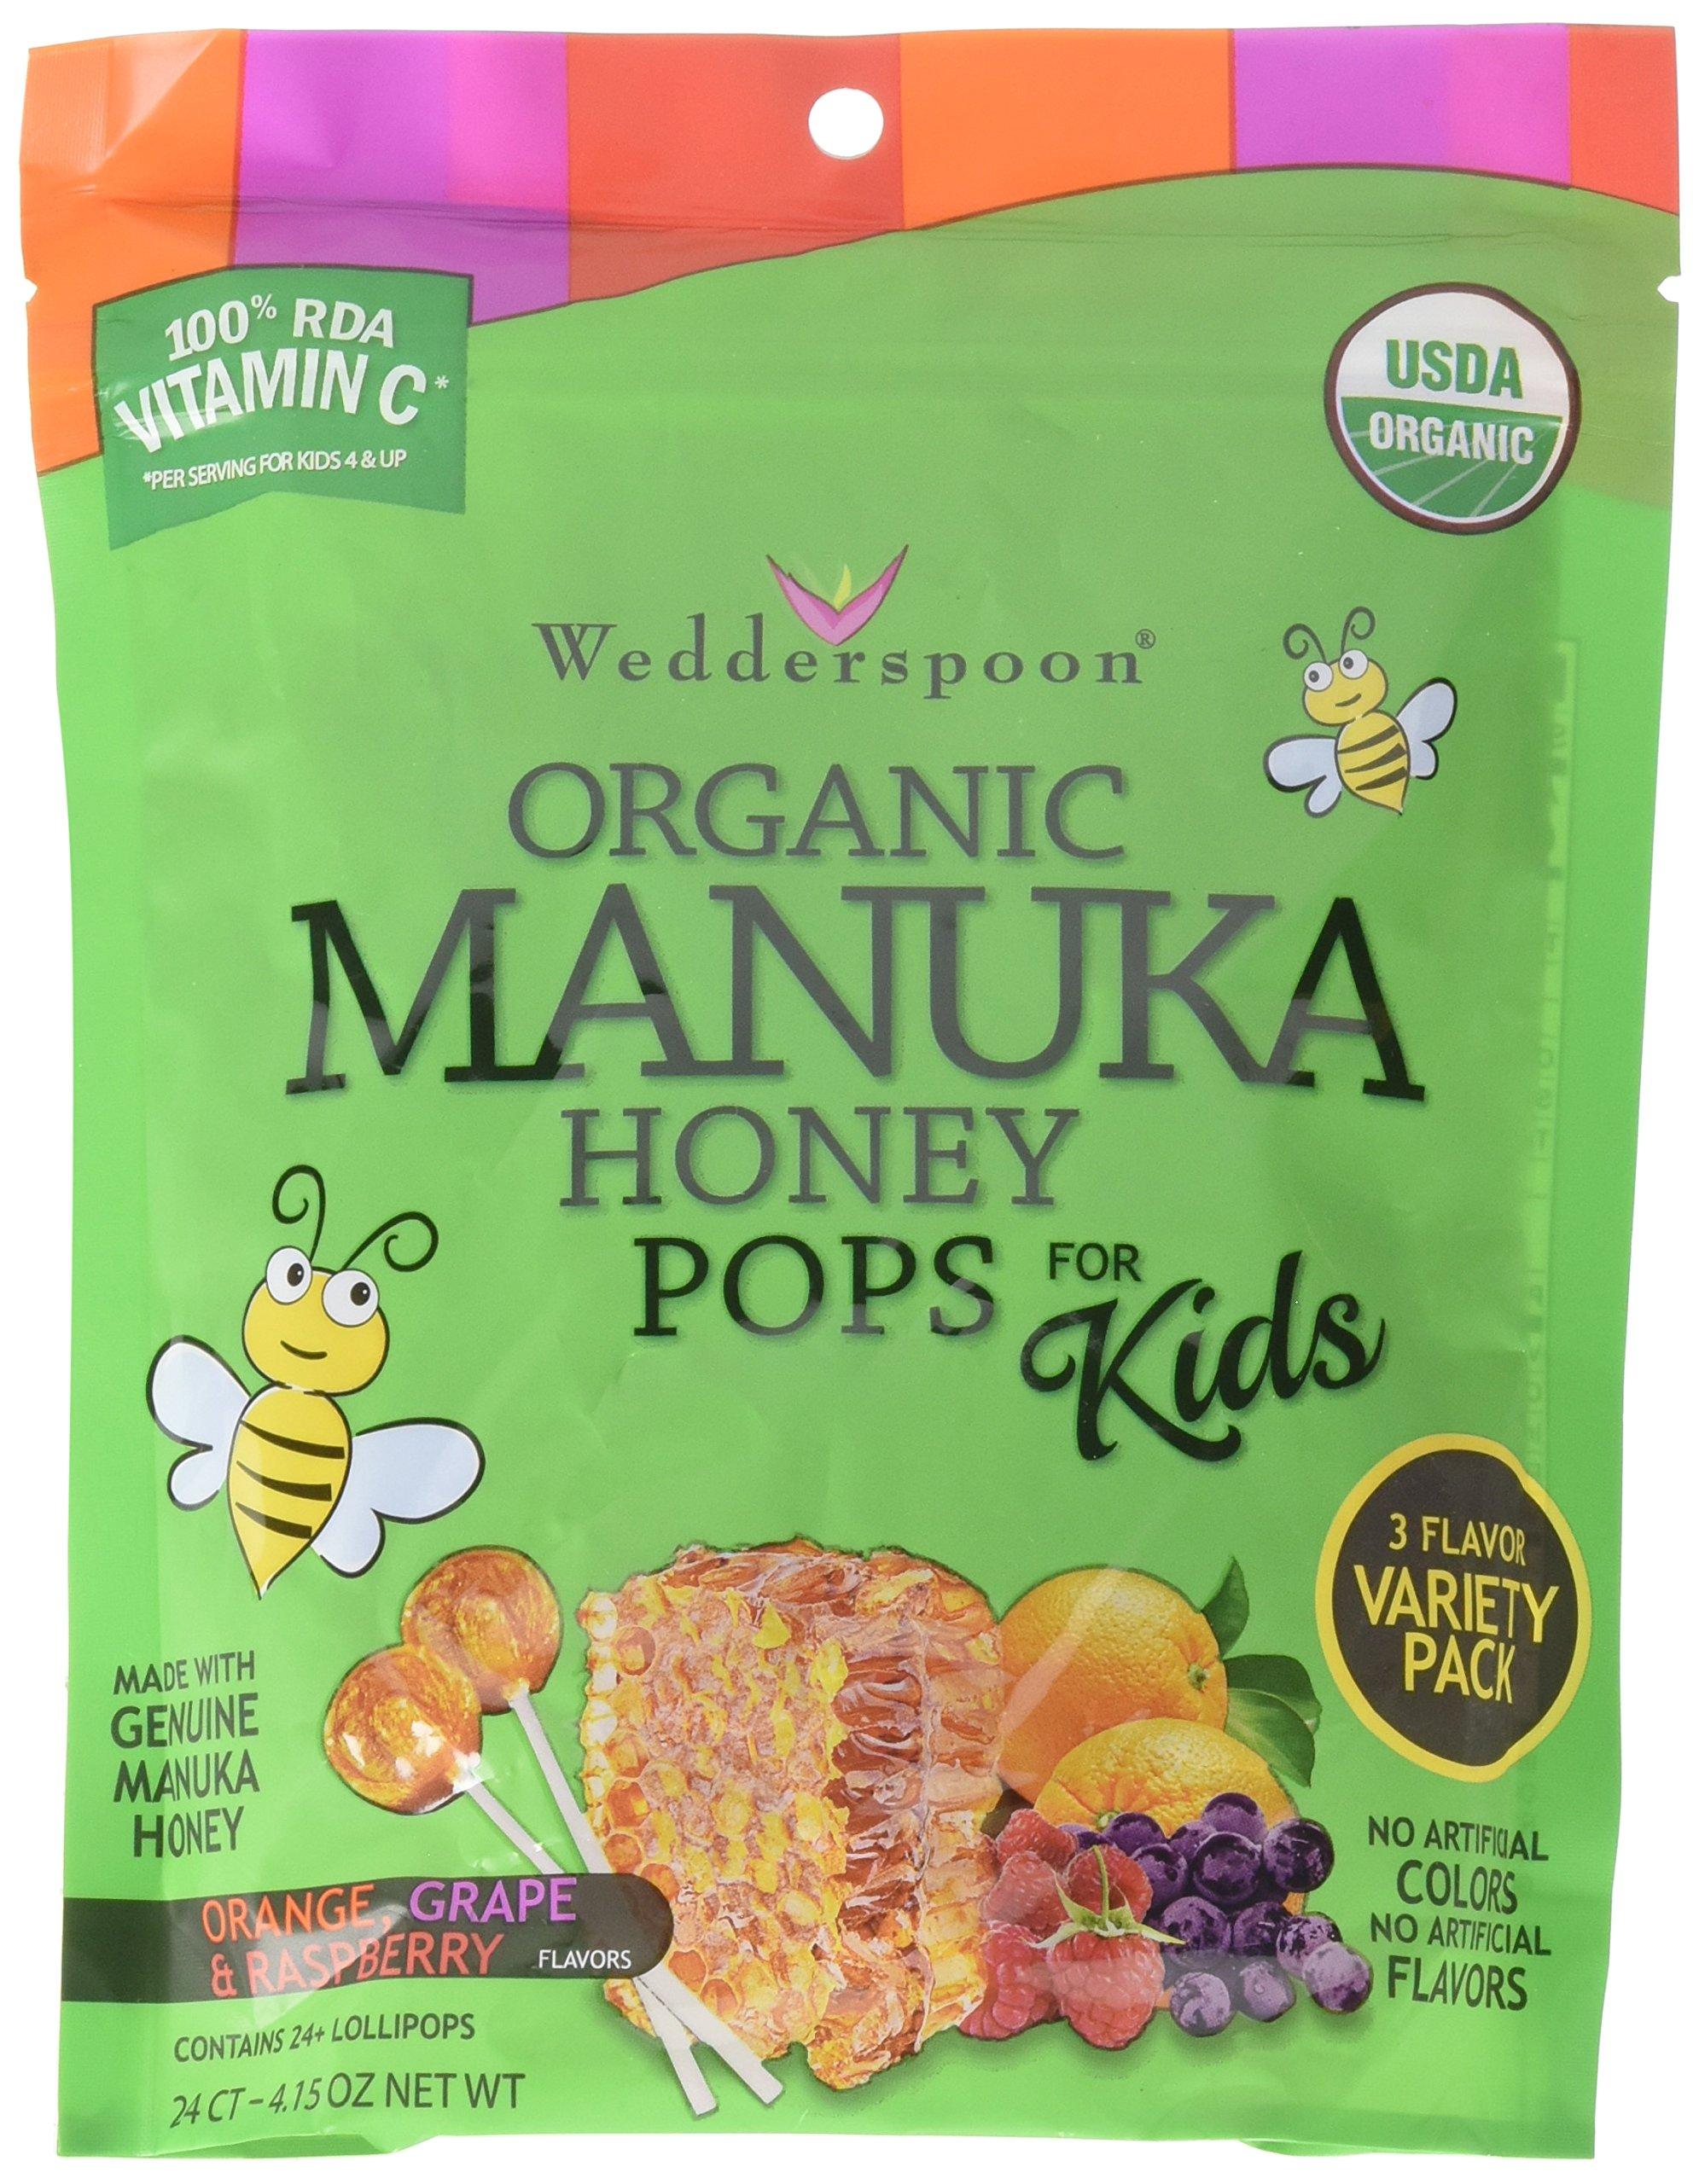 Wedderspoon Organic Manuka Honey Pops for Kids, Variety Pack, 24 count